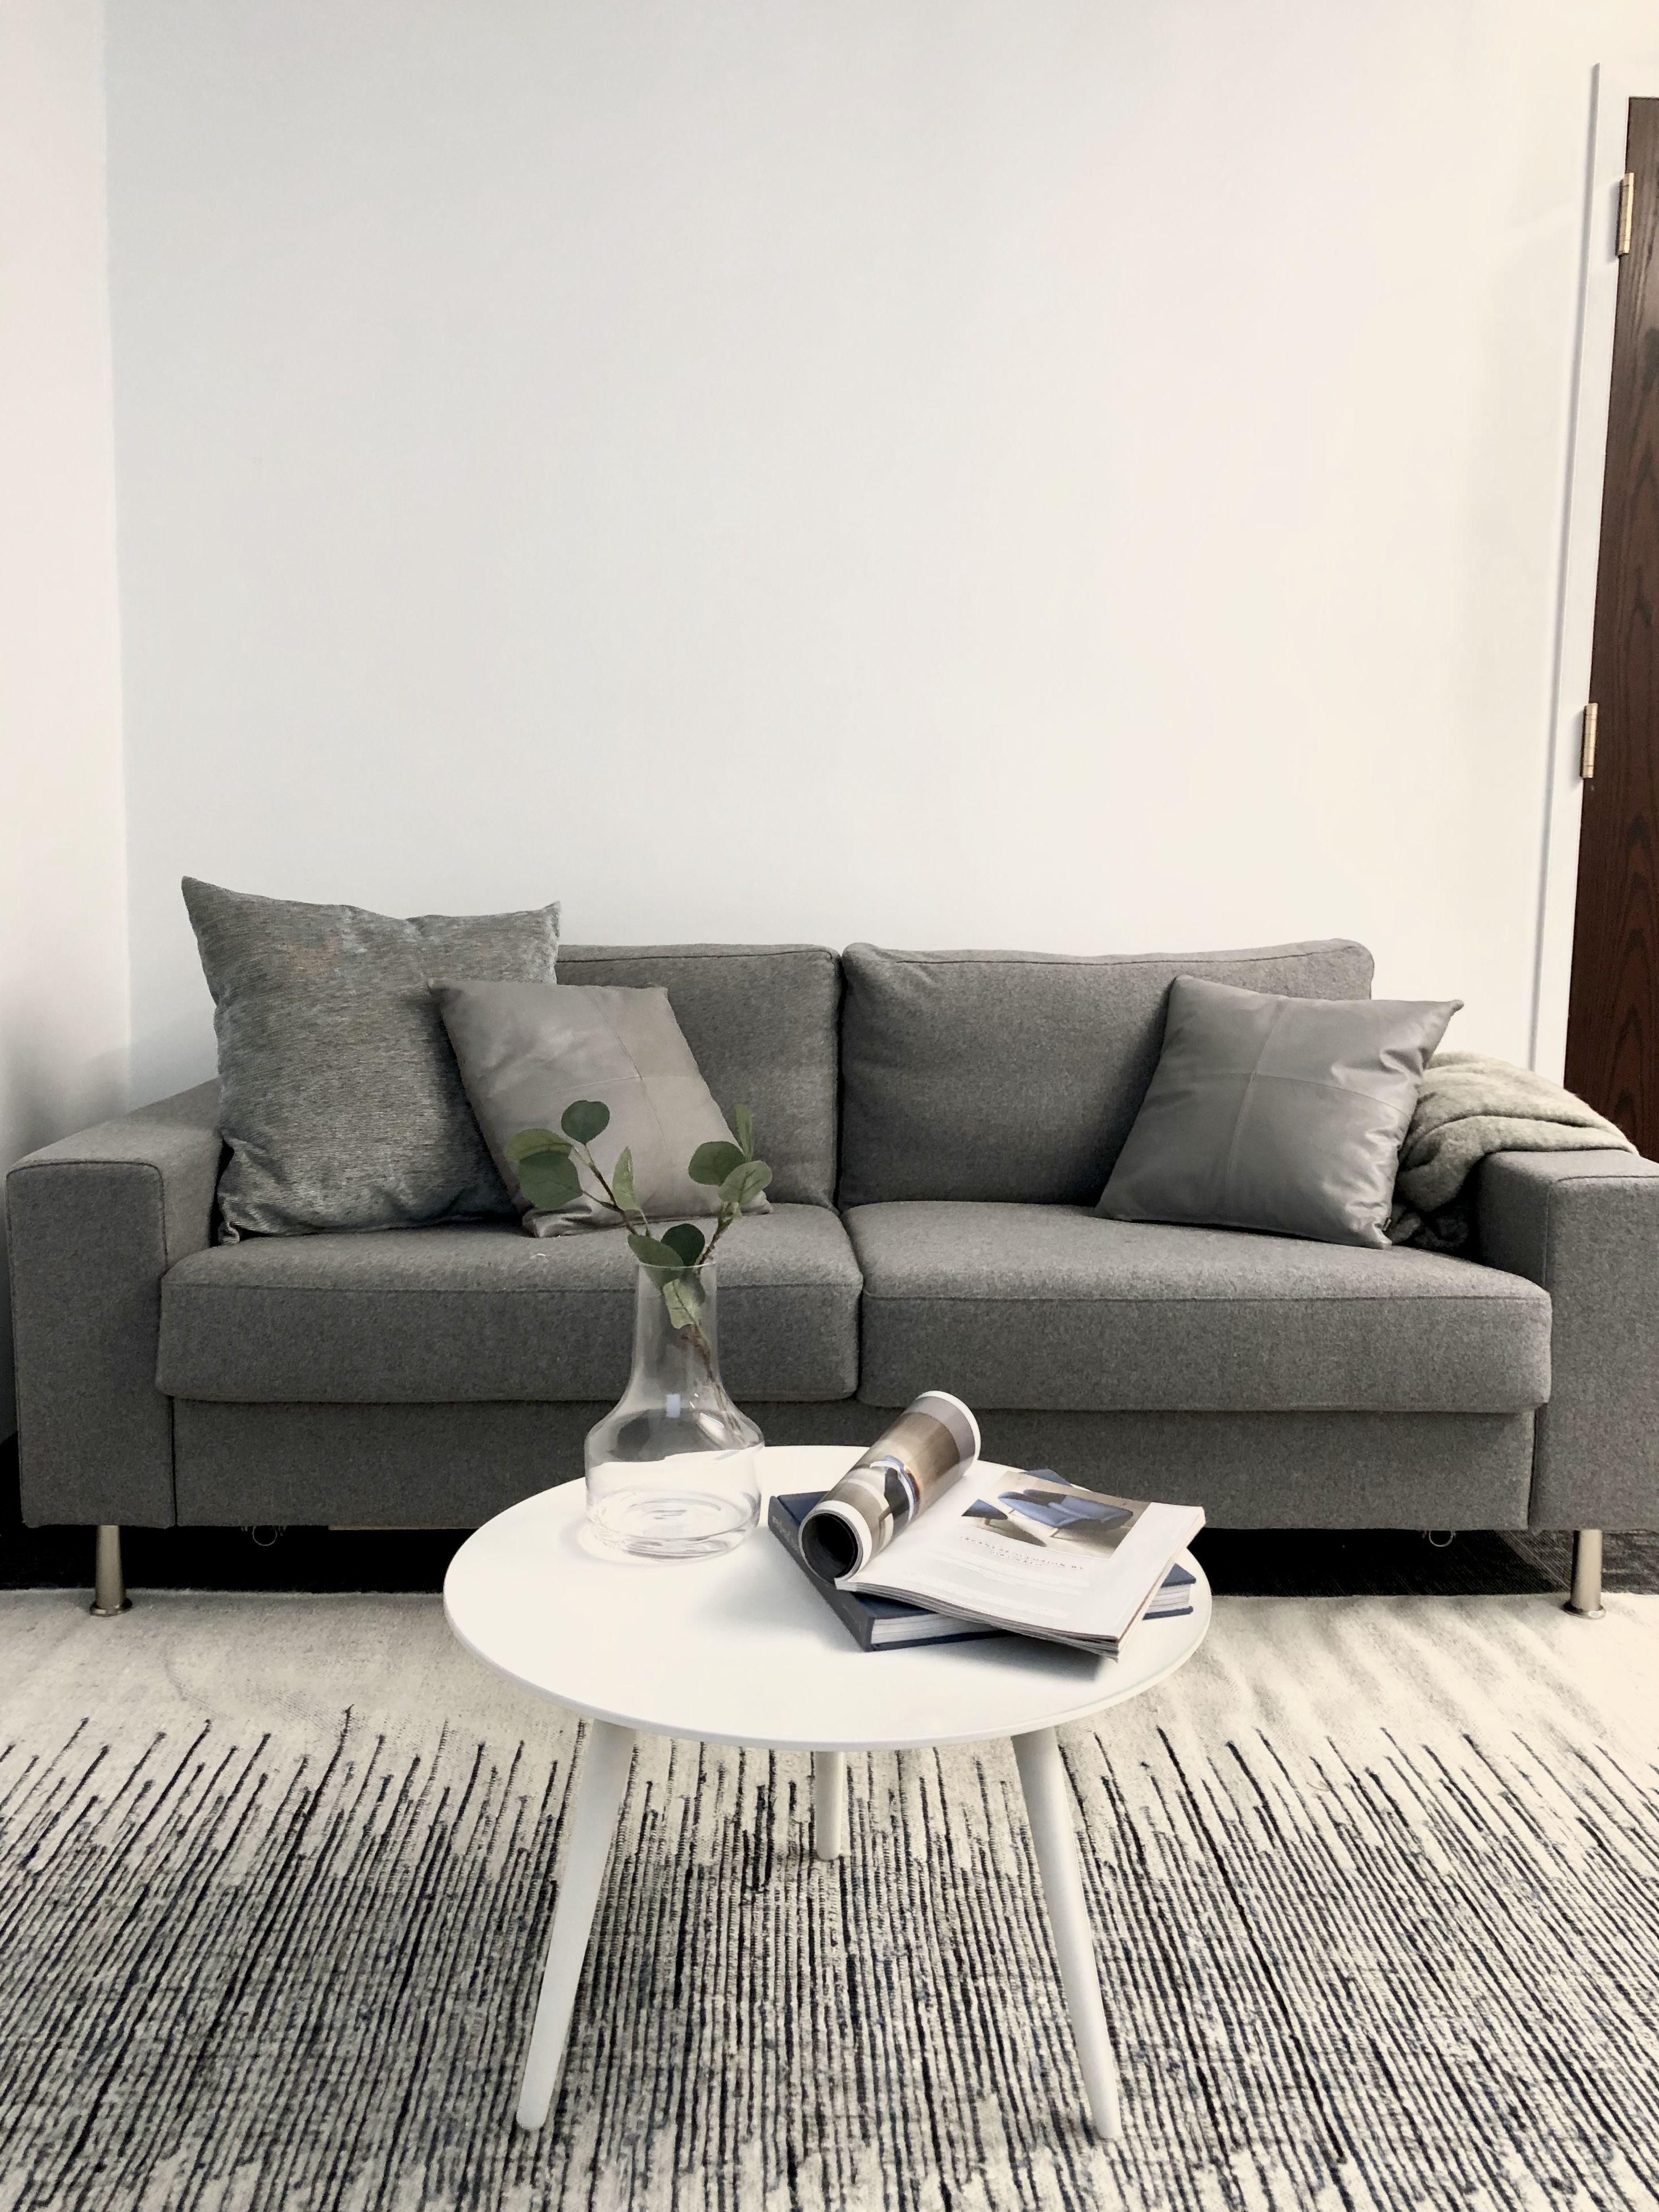 Boconcept Indivi 2 Sofa Bed Bornhlom Table Usaki Rug Designed